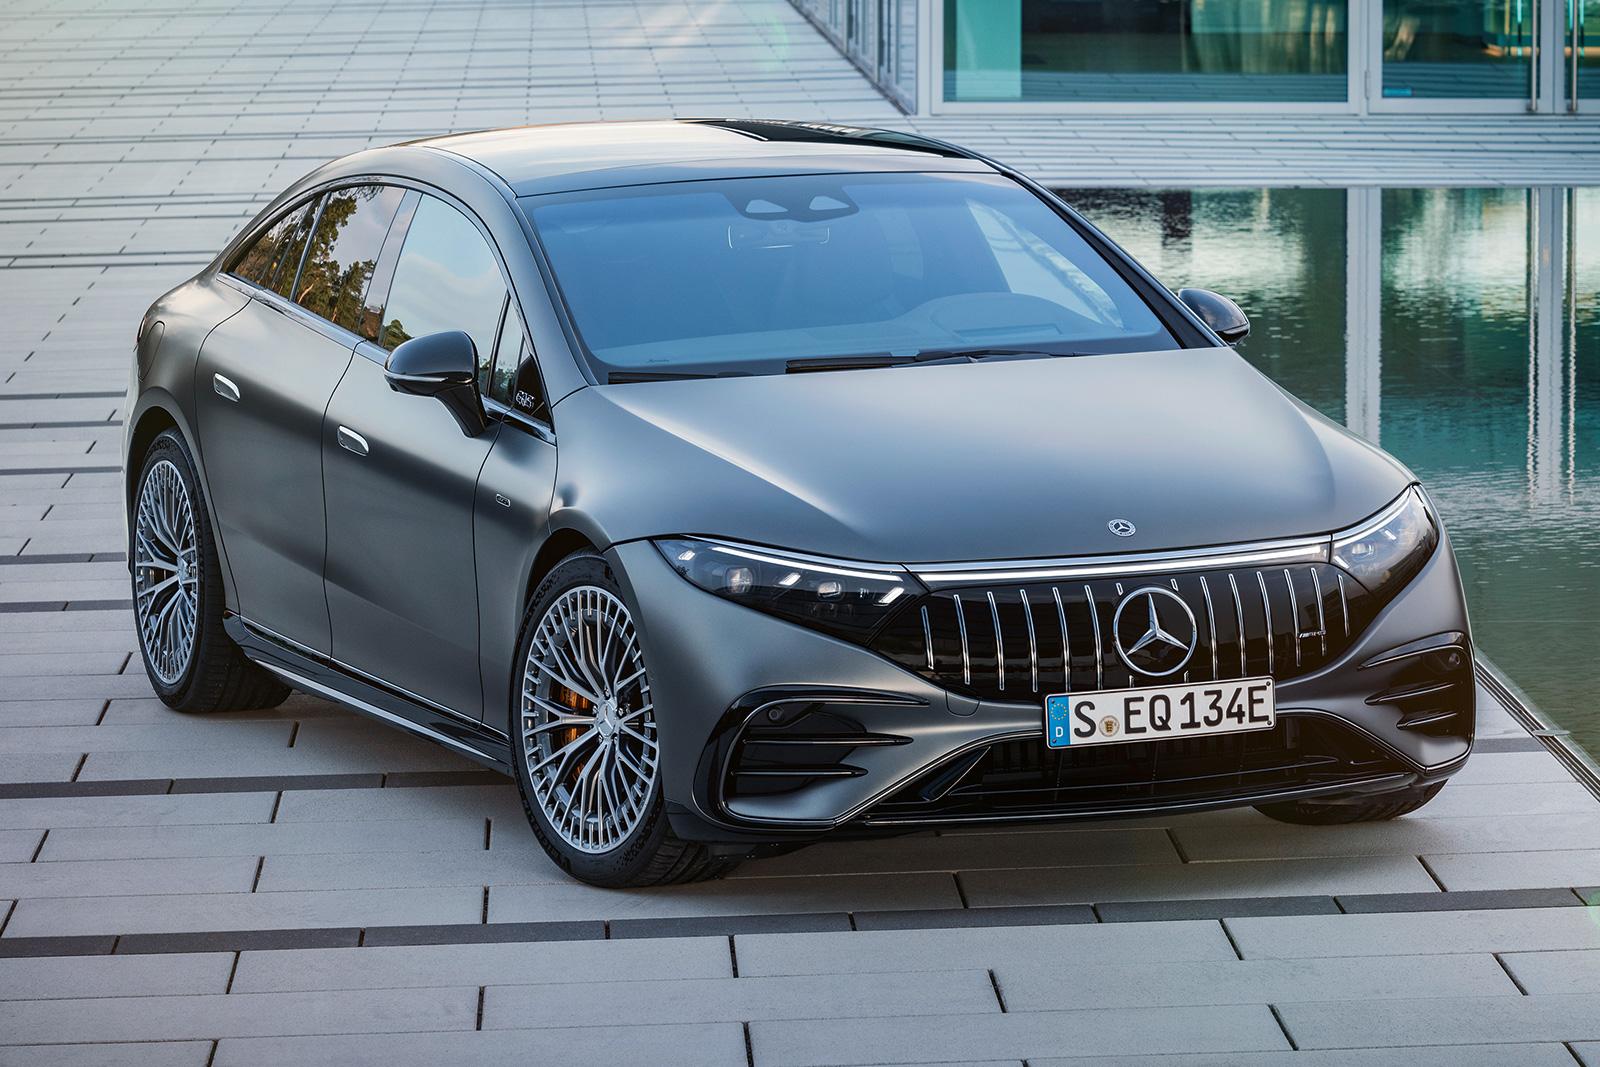 Mercedes-Benz AMG EQS 53 4MATIC+ electric sedan